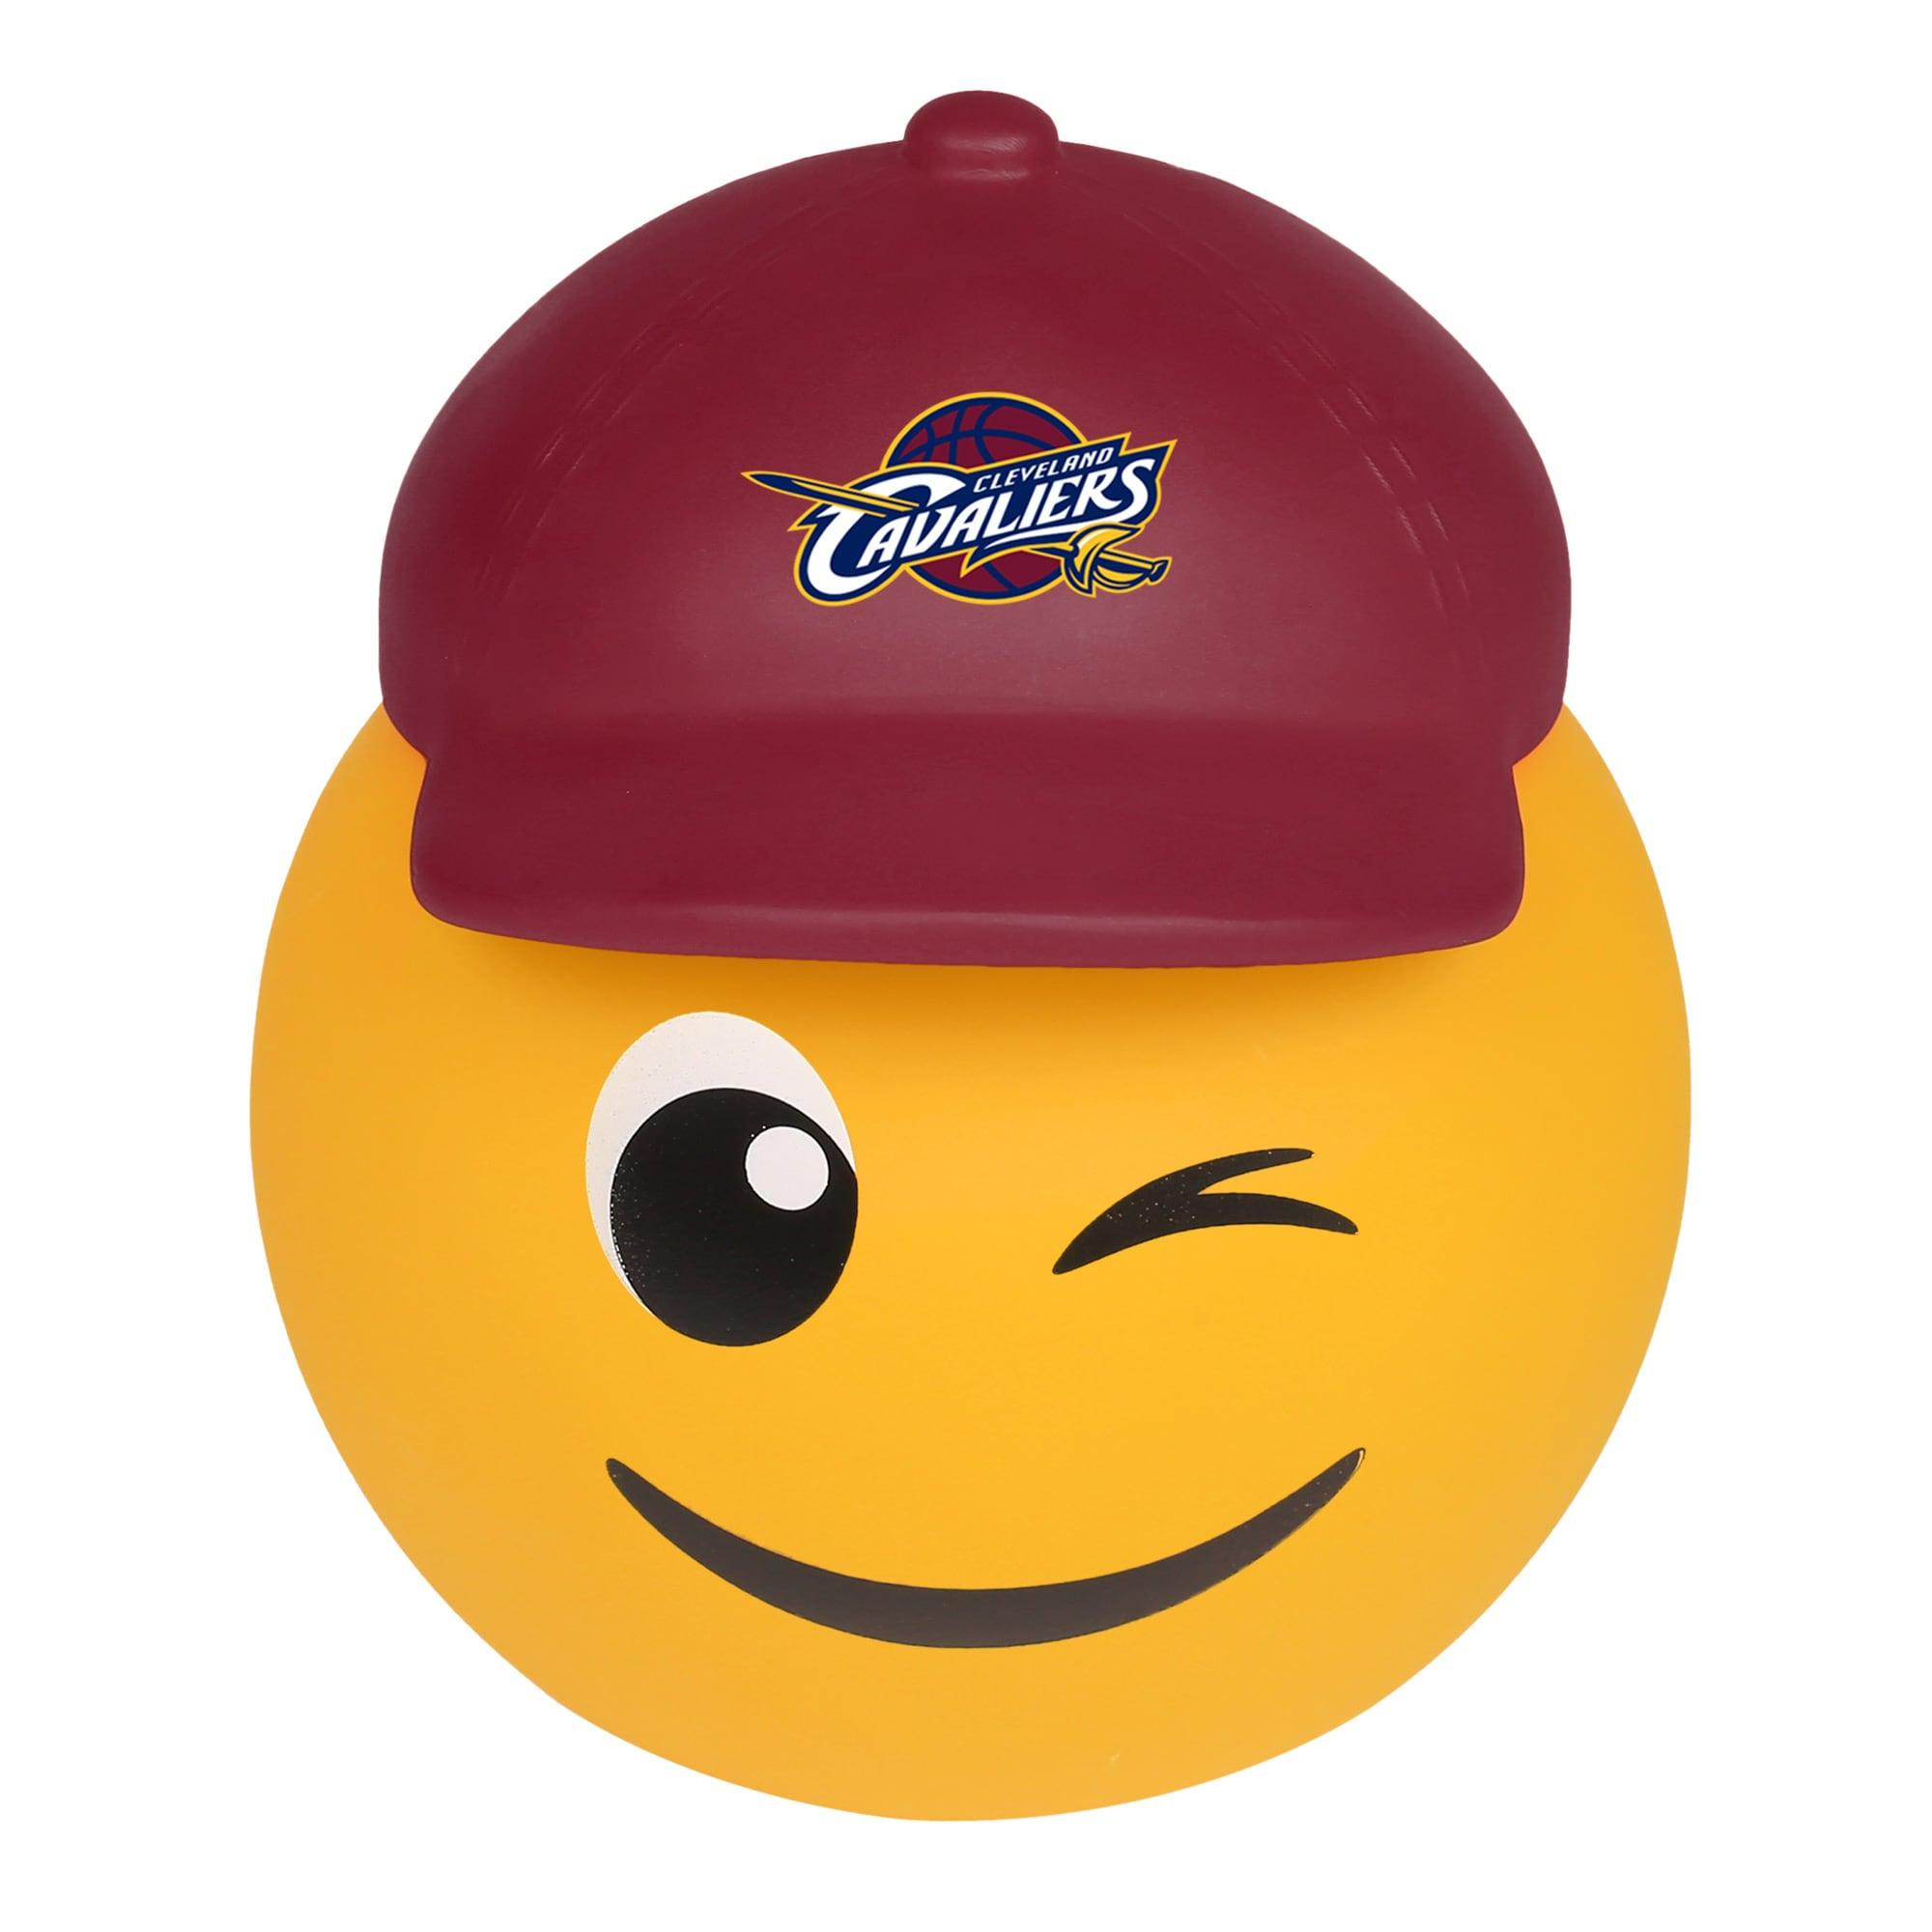 Cleveland Cavaliers Teamoji Wink Vinyl Bank